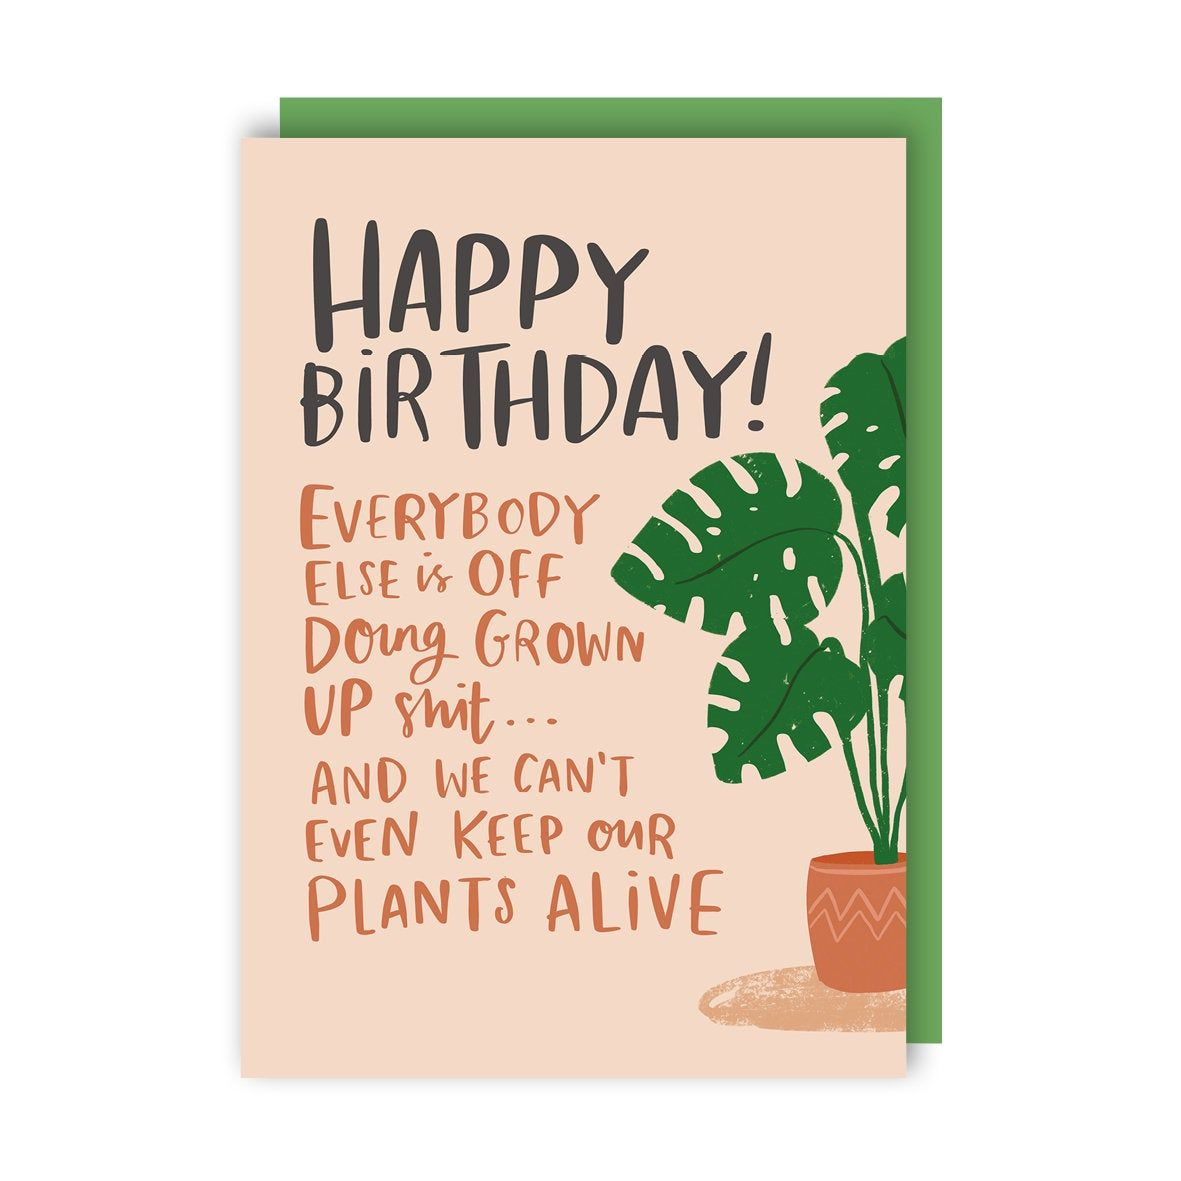 Plants Birthday Card Funny Humour Drinking Grown Up Etsy Funny Birthday Cards Birthday Cards Birthday Humor